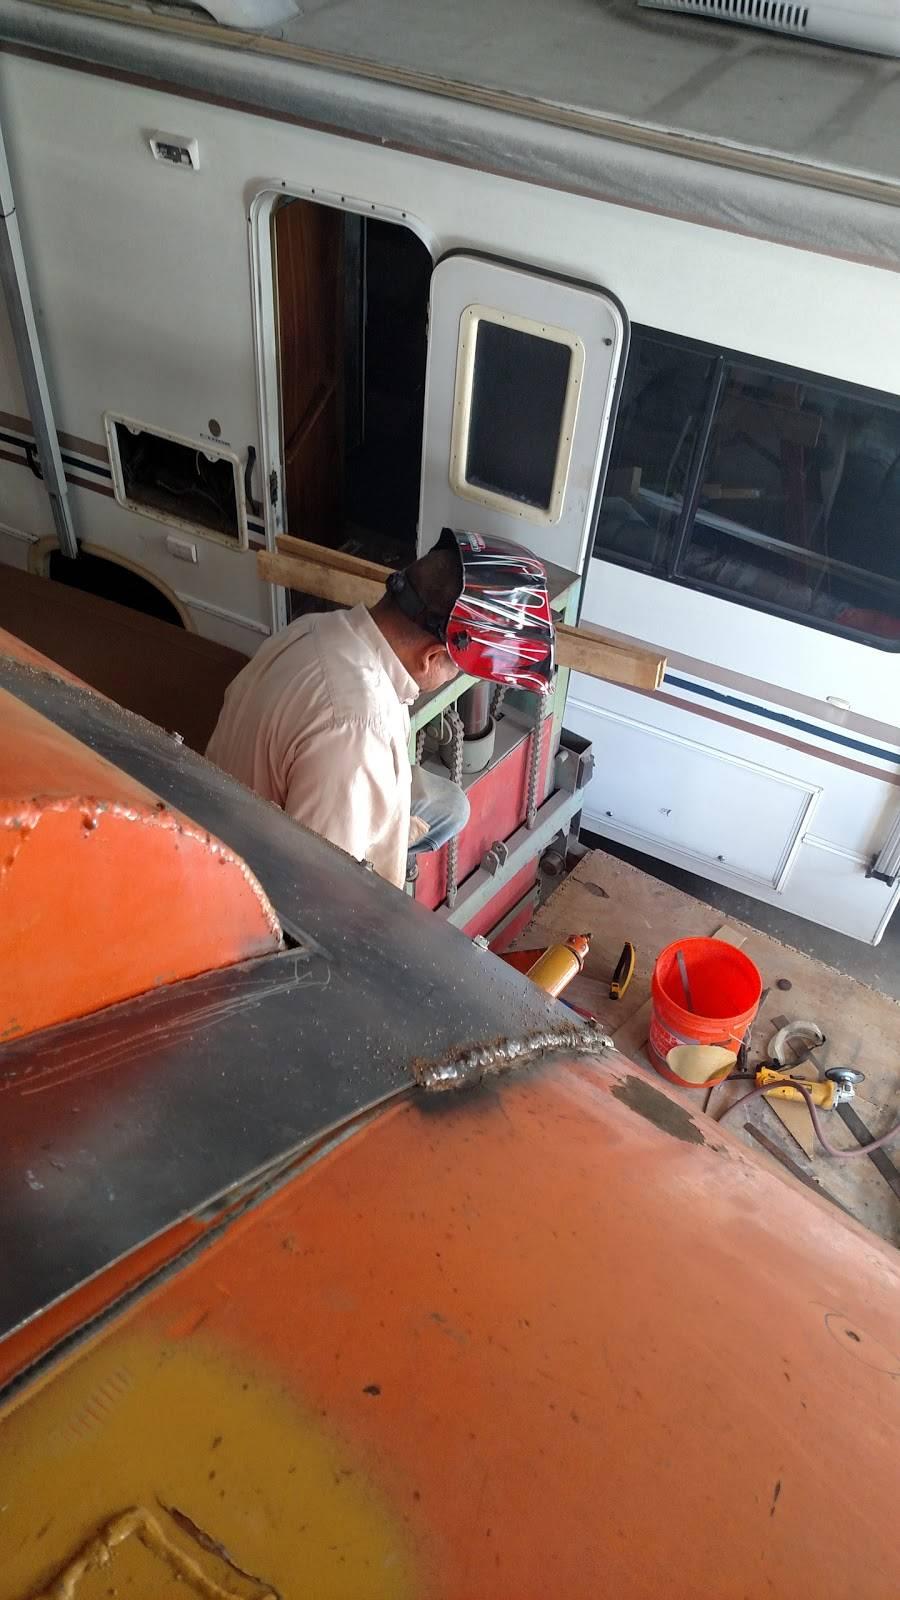 AA Truck & Auto - car repair  | Photo 1 of 6 | Address: 8536 Terminal Rd, Lorton, VA 22079, USA | Phone: (703) 550-5533